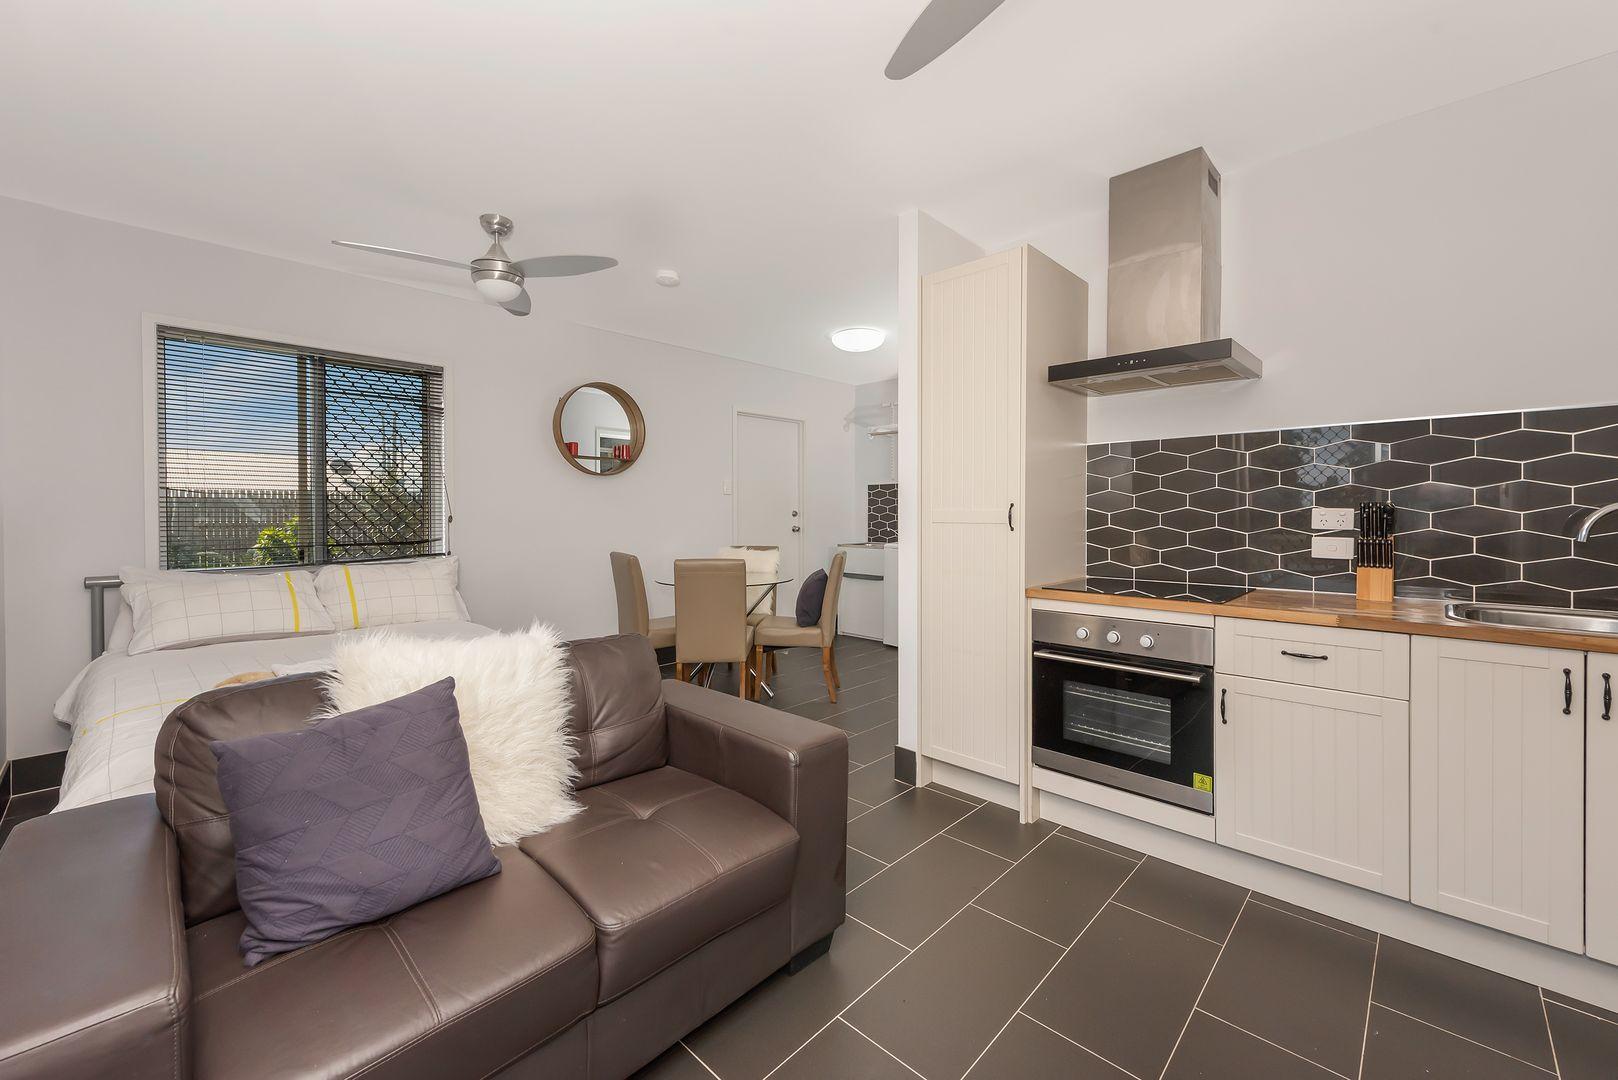 2/60 Meenan Street, Garbutt QLD 4814, Image 1